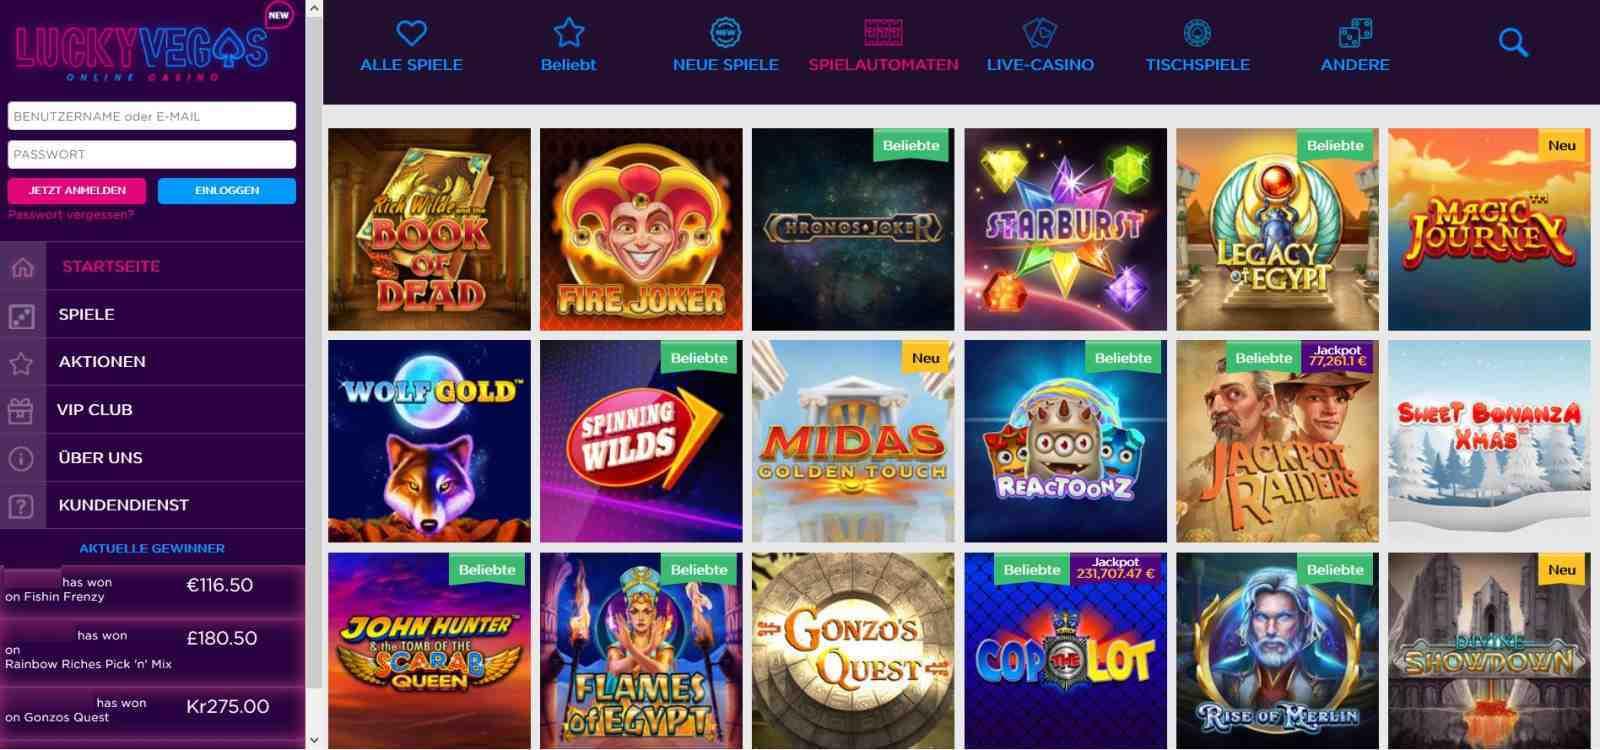 Lucky Vegas Spielautomaten